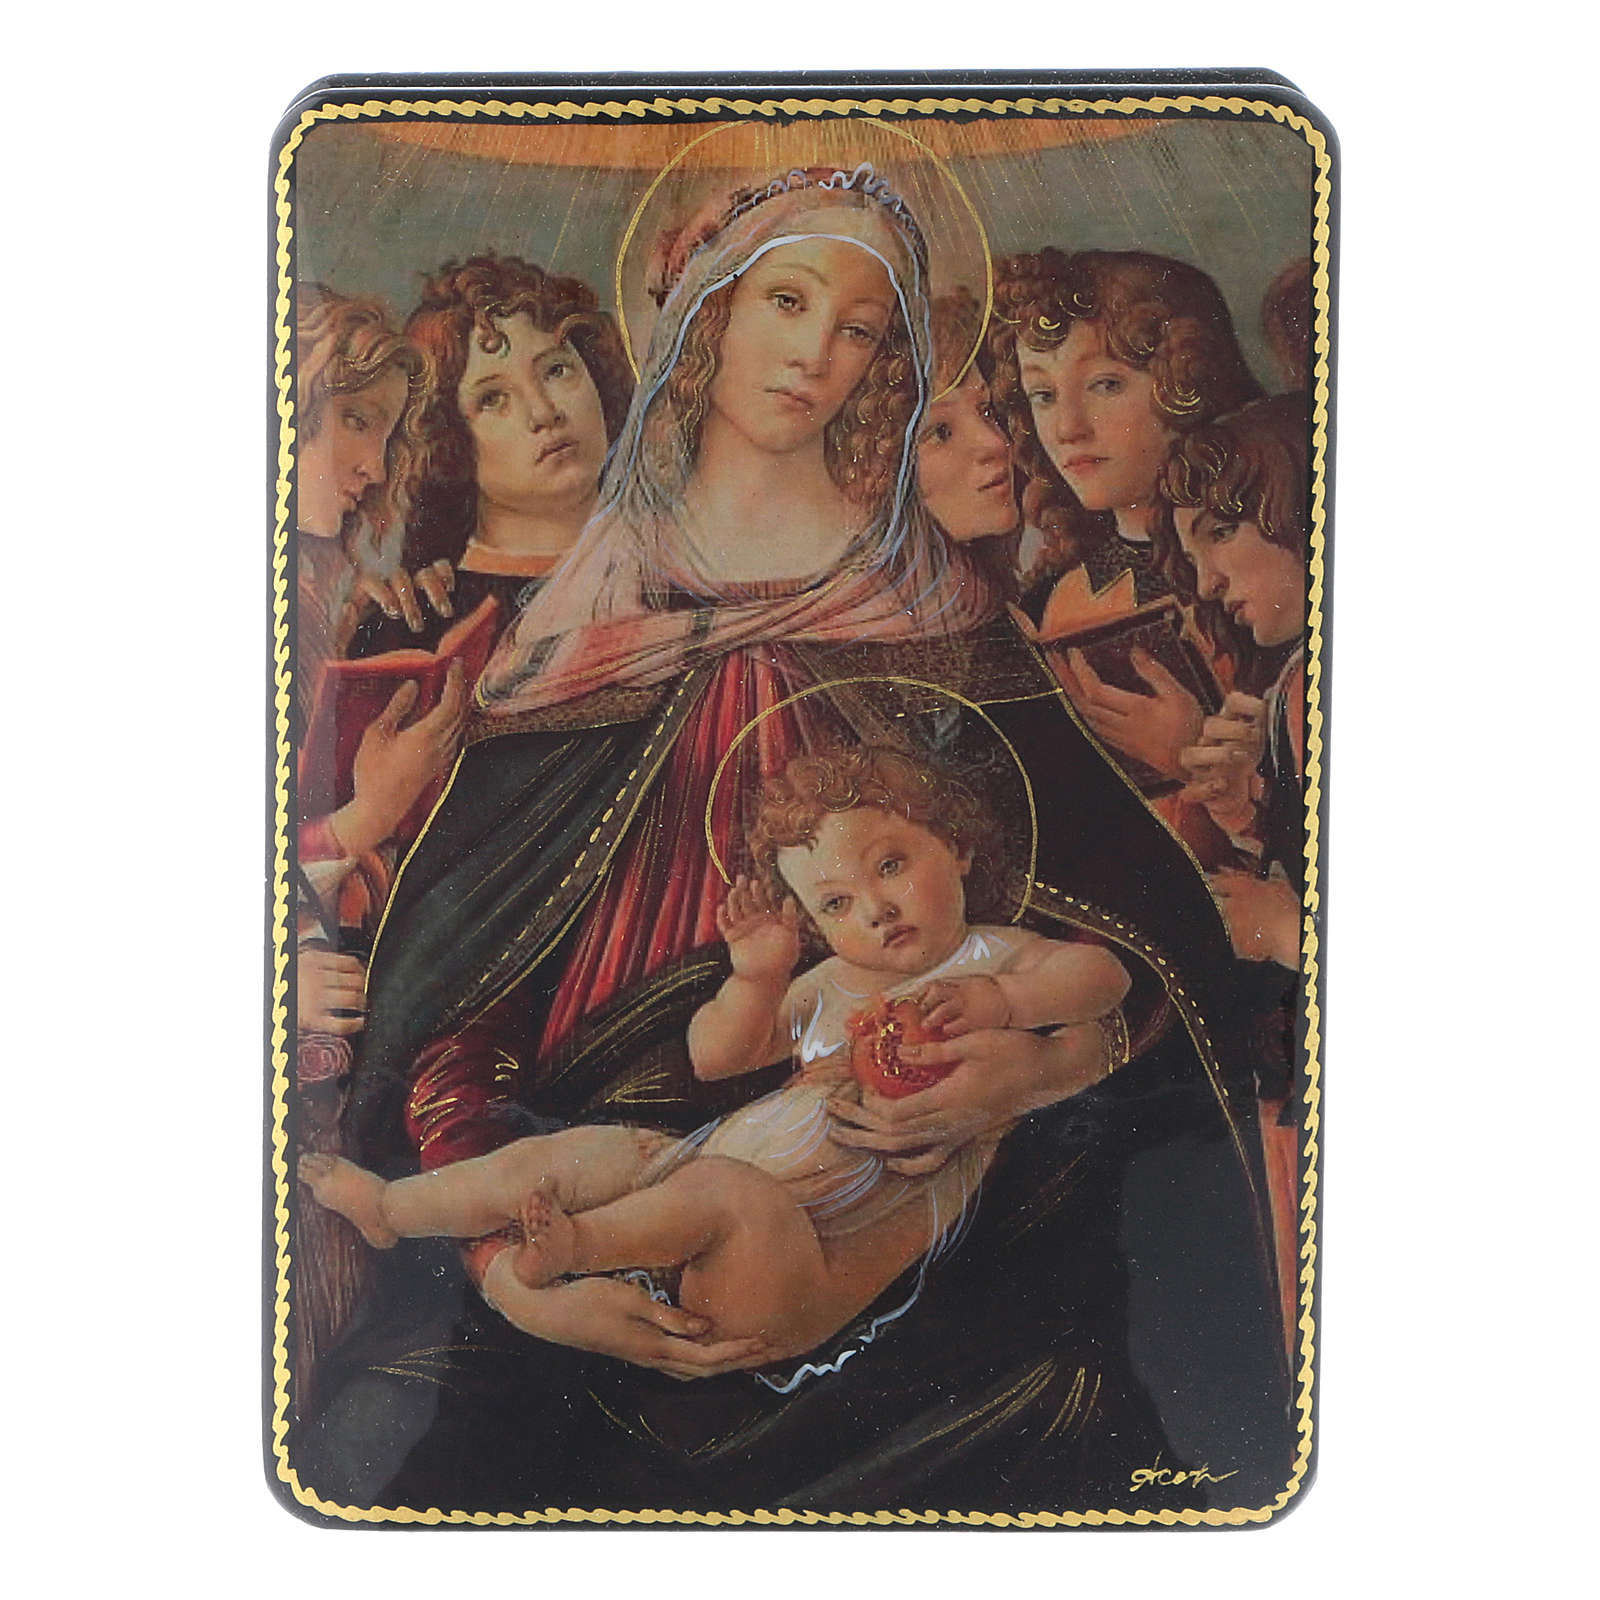 Scatola russa Papier-mâché Nascita Gesù Cristo Fedoskino style 15x11 4